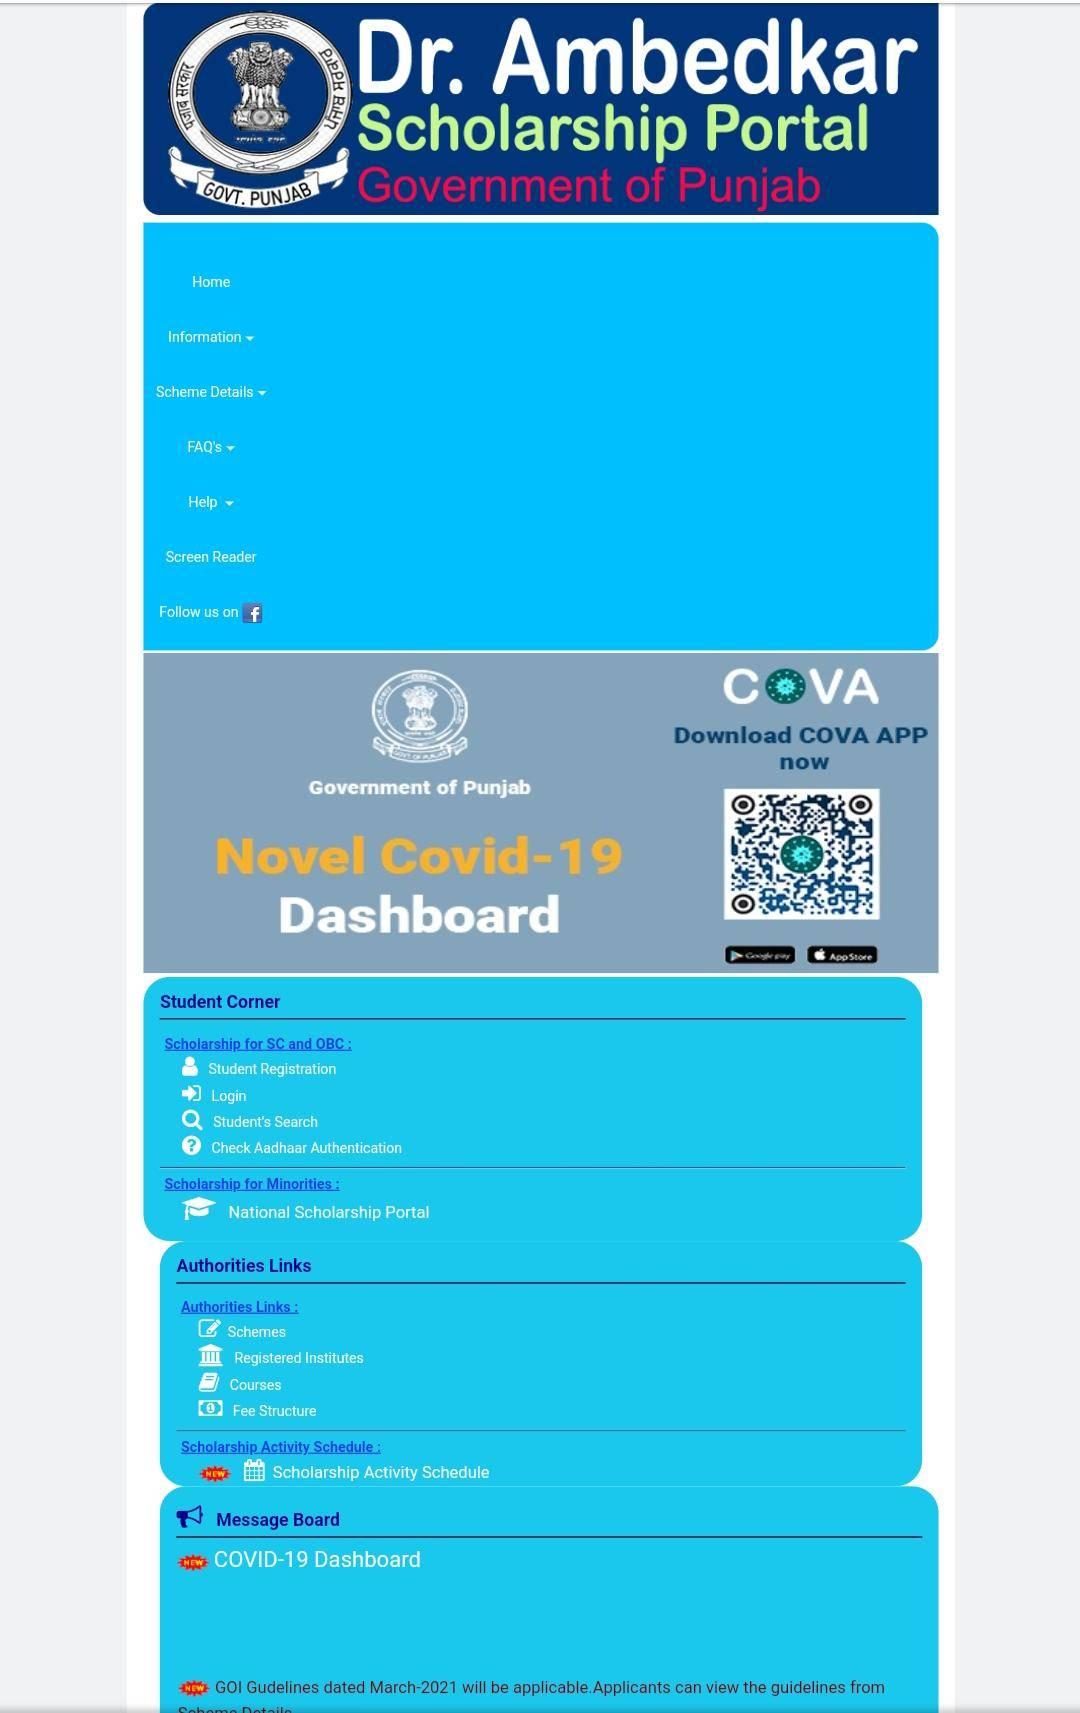 How to Apply Online for Dr. Ambedkar Scholarship Punjab